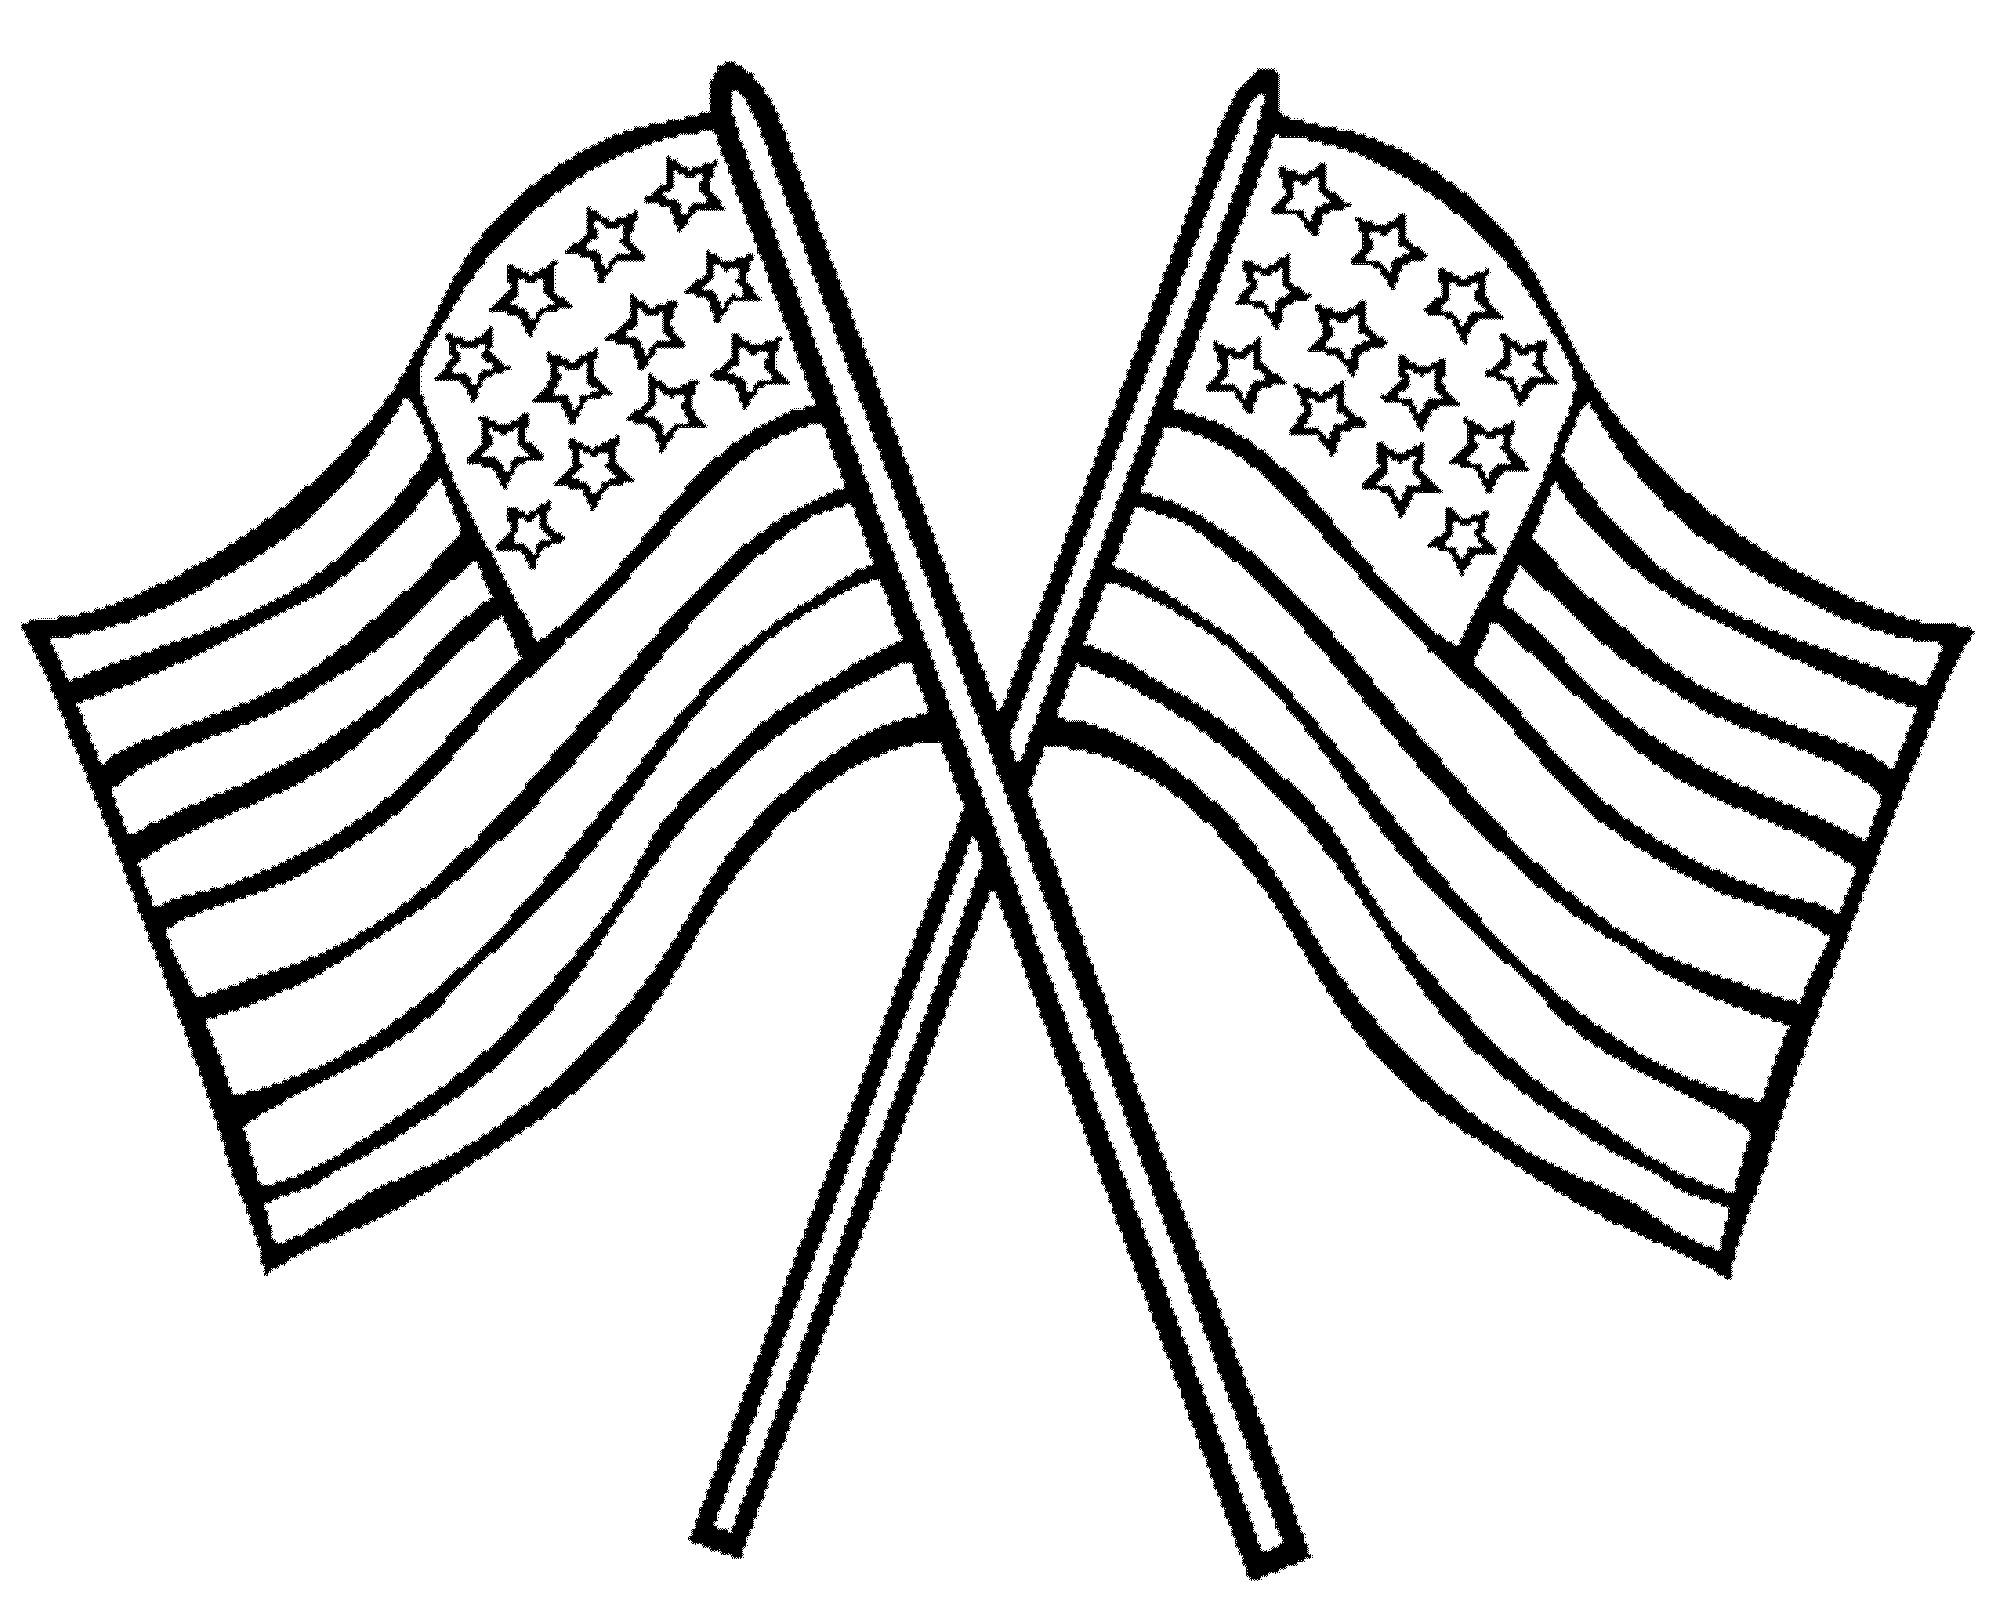 2000x1623 Awesome Free Printable American Flag Coloring Sheets Gulfmik